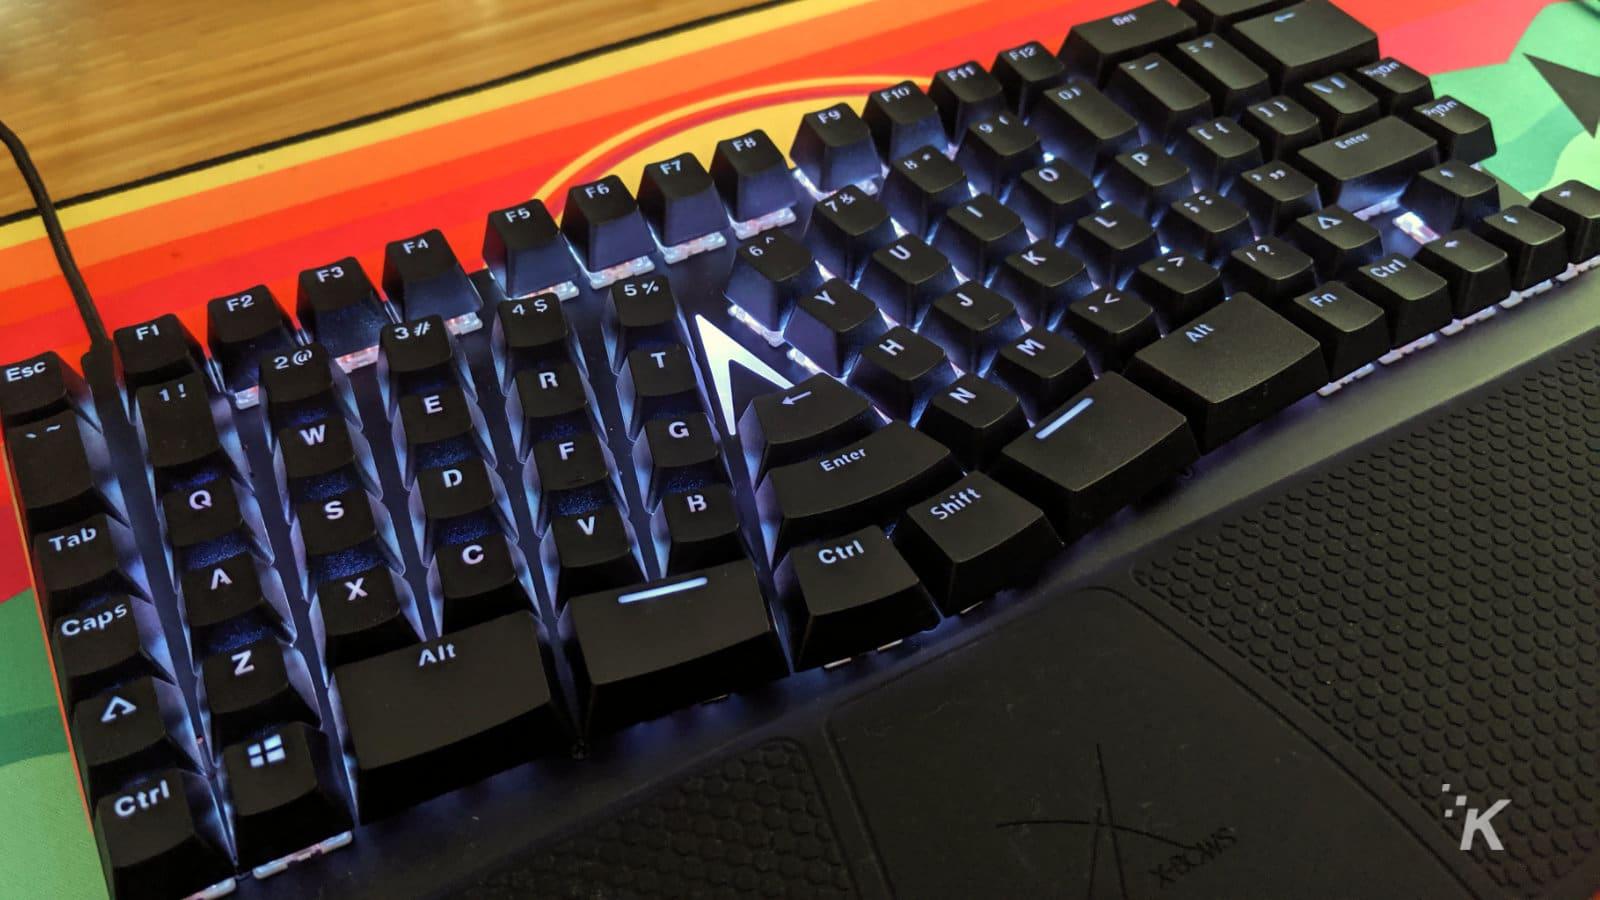 xbows ergonomic keyboard